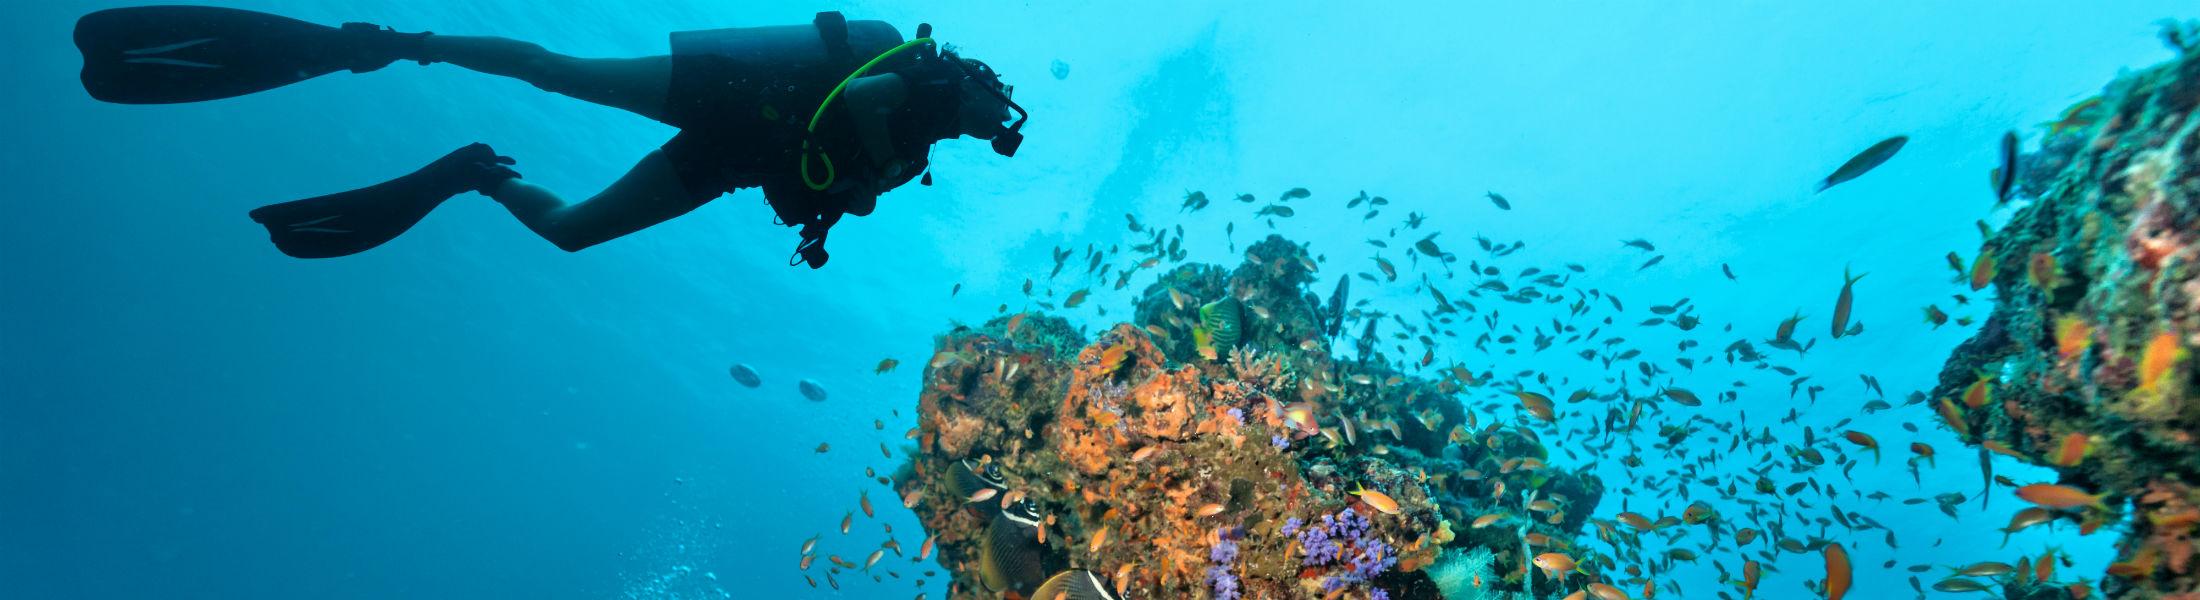 Explore the amazing coral reef